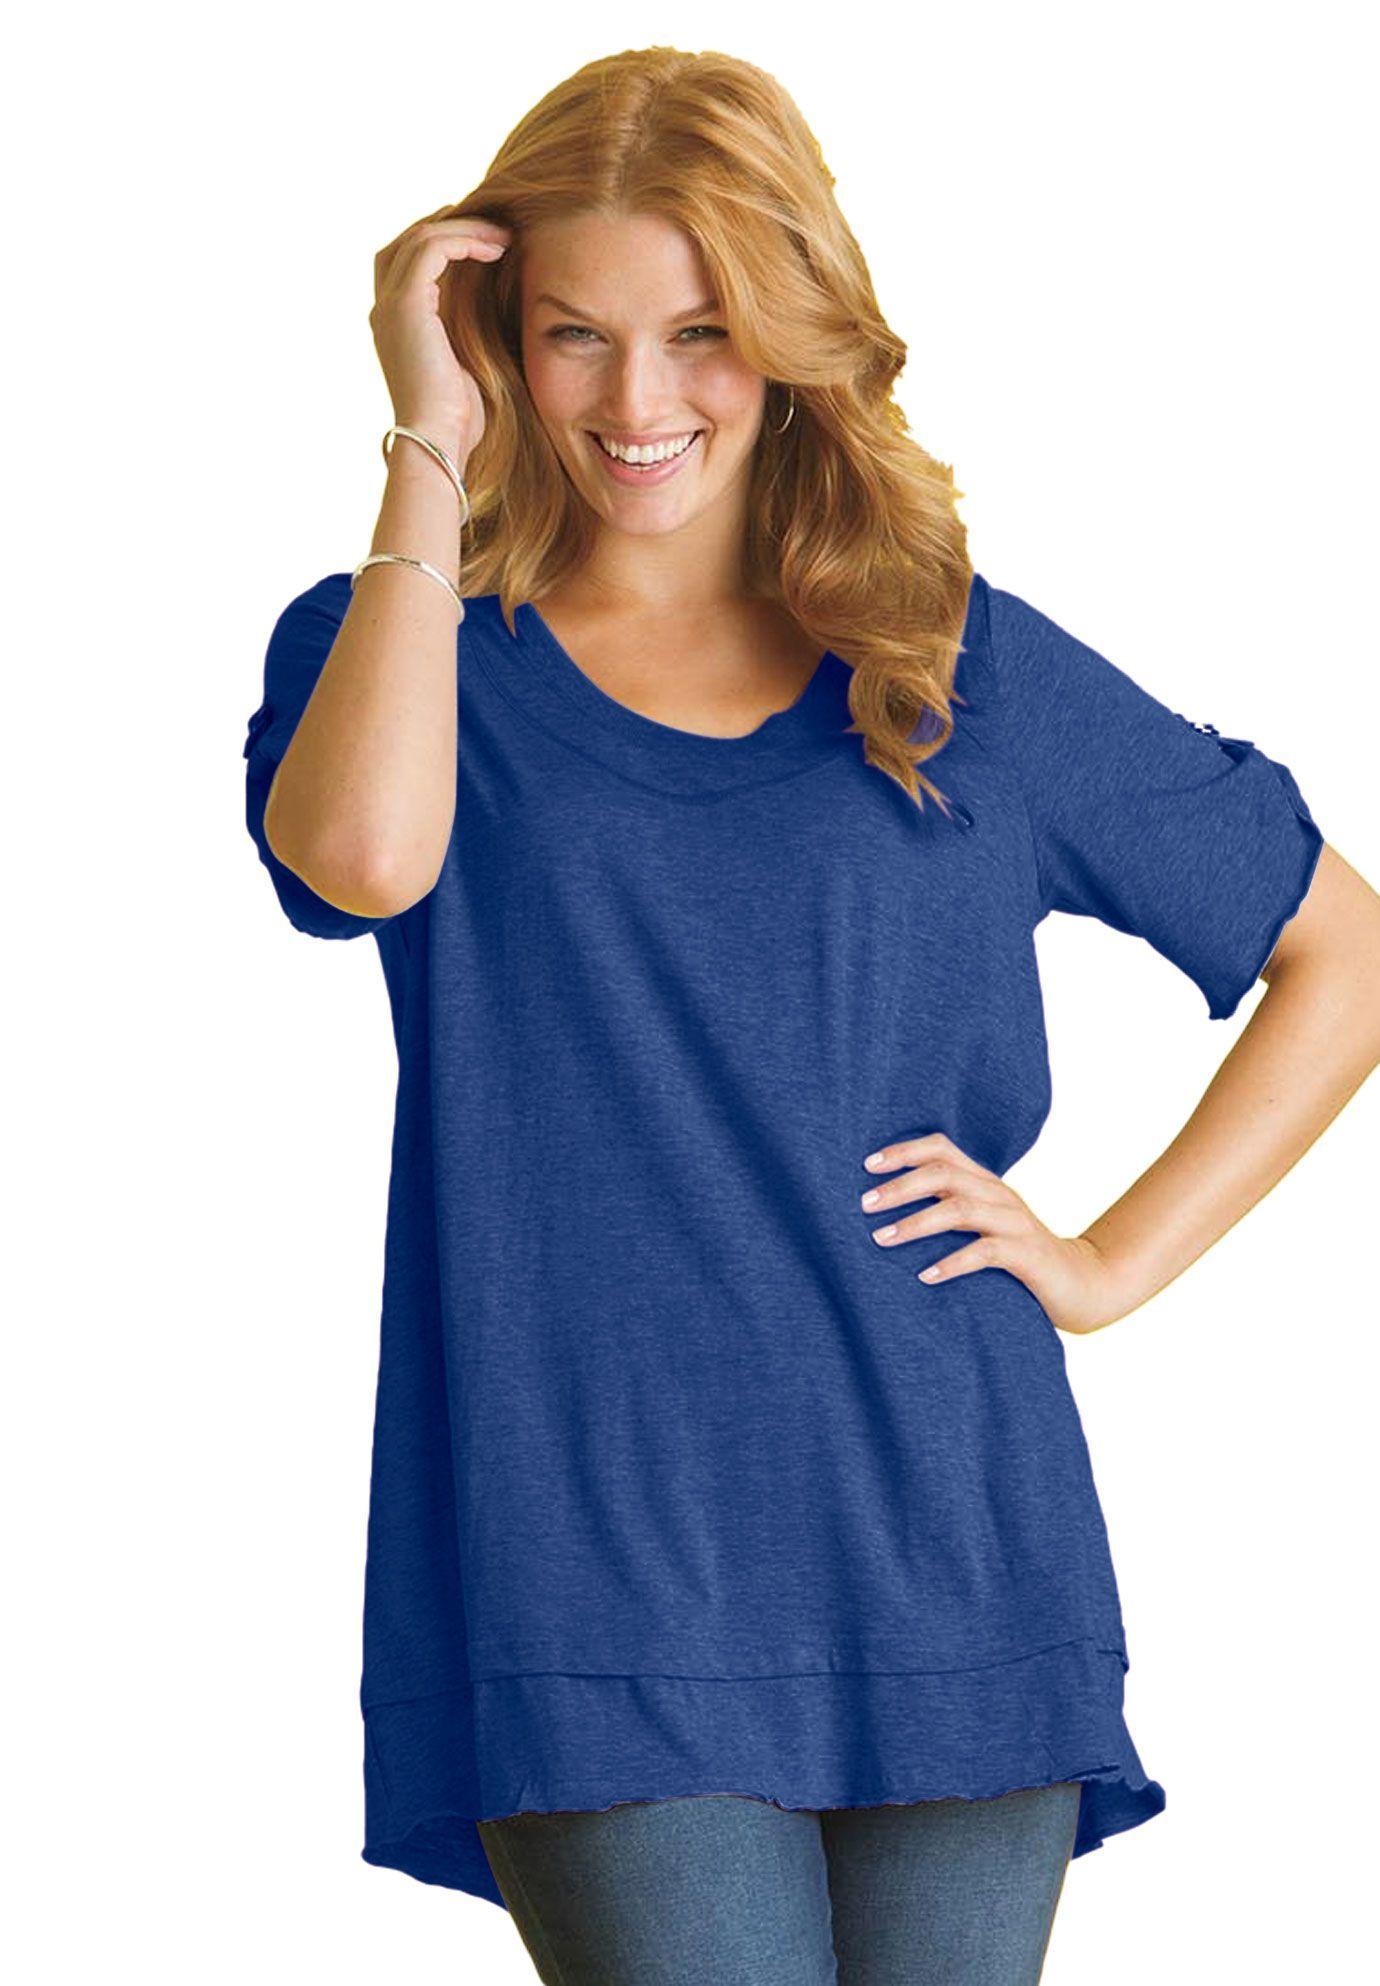 Layered look knit mega tunic top image